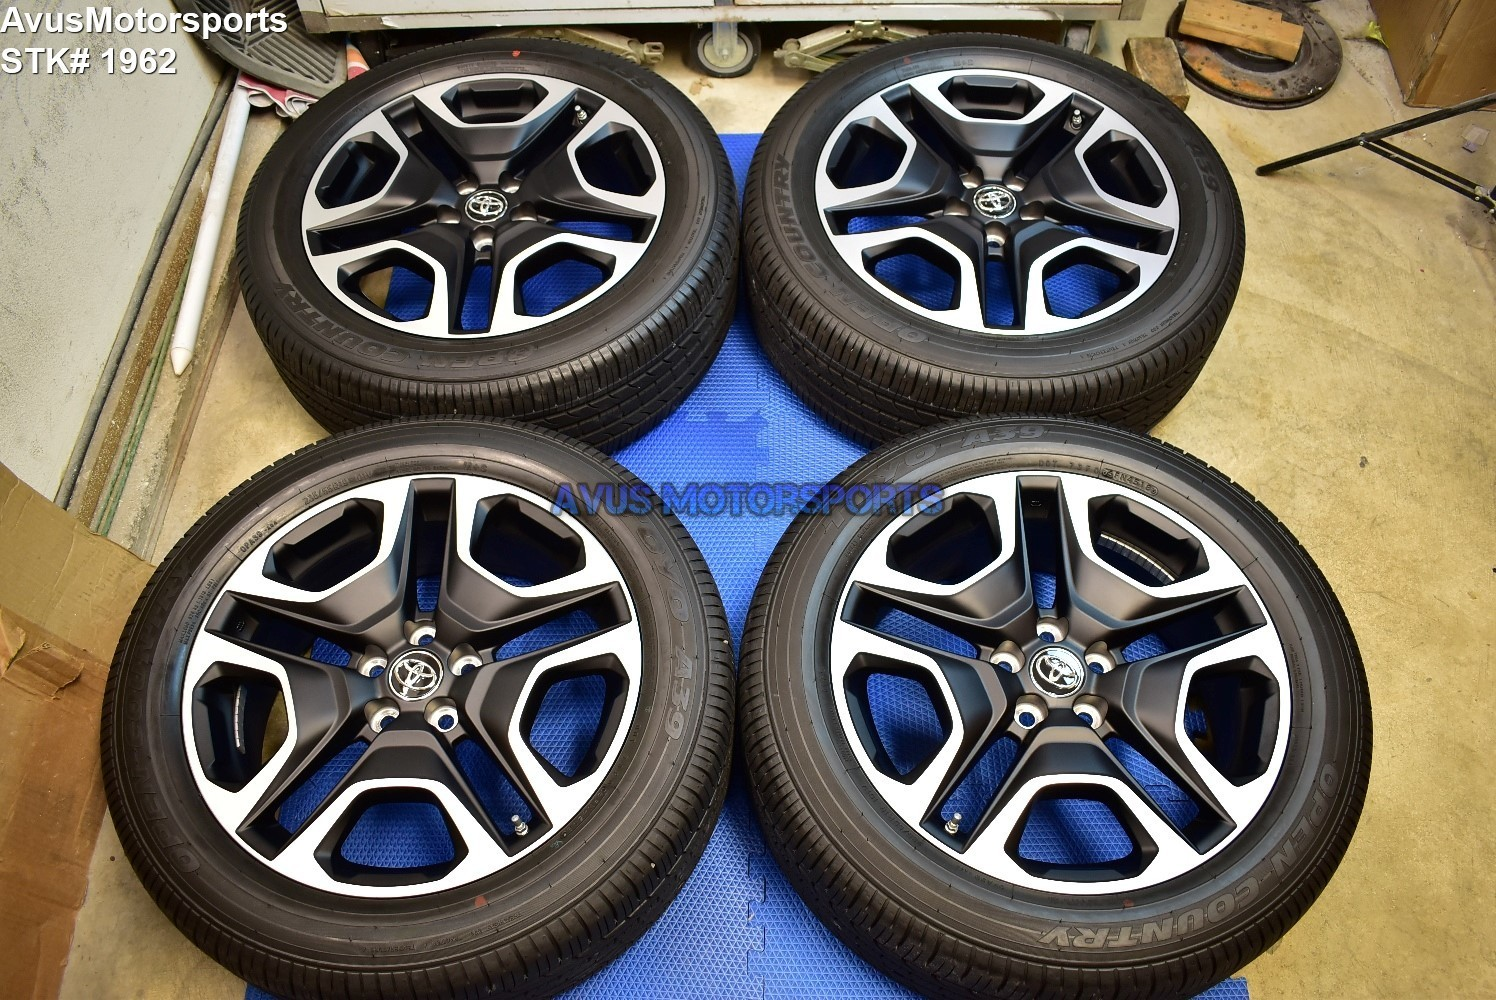 "19"" Toyota Rav4 Adventure OEM Factory Black Wheels & Tires 235/55r18 + TPMS 2019"